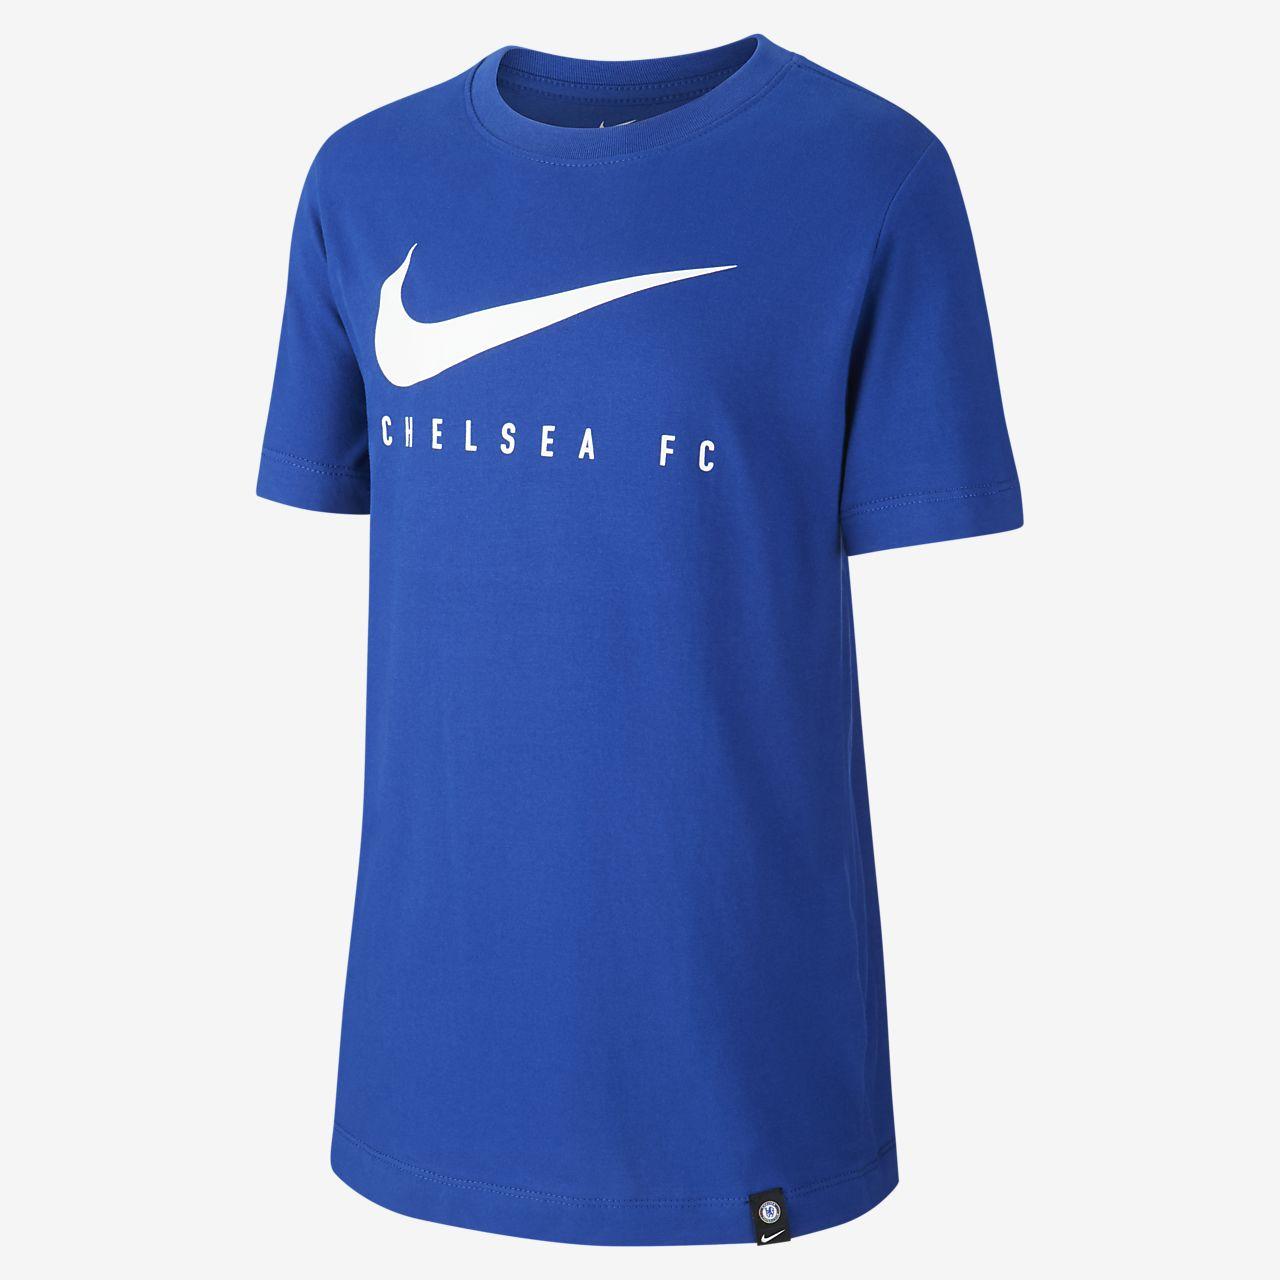 Playera de fútbol para niños talla grande Nike Dri-FIT Chelsea FC